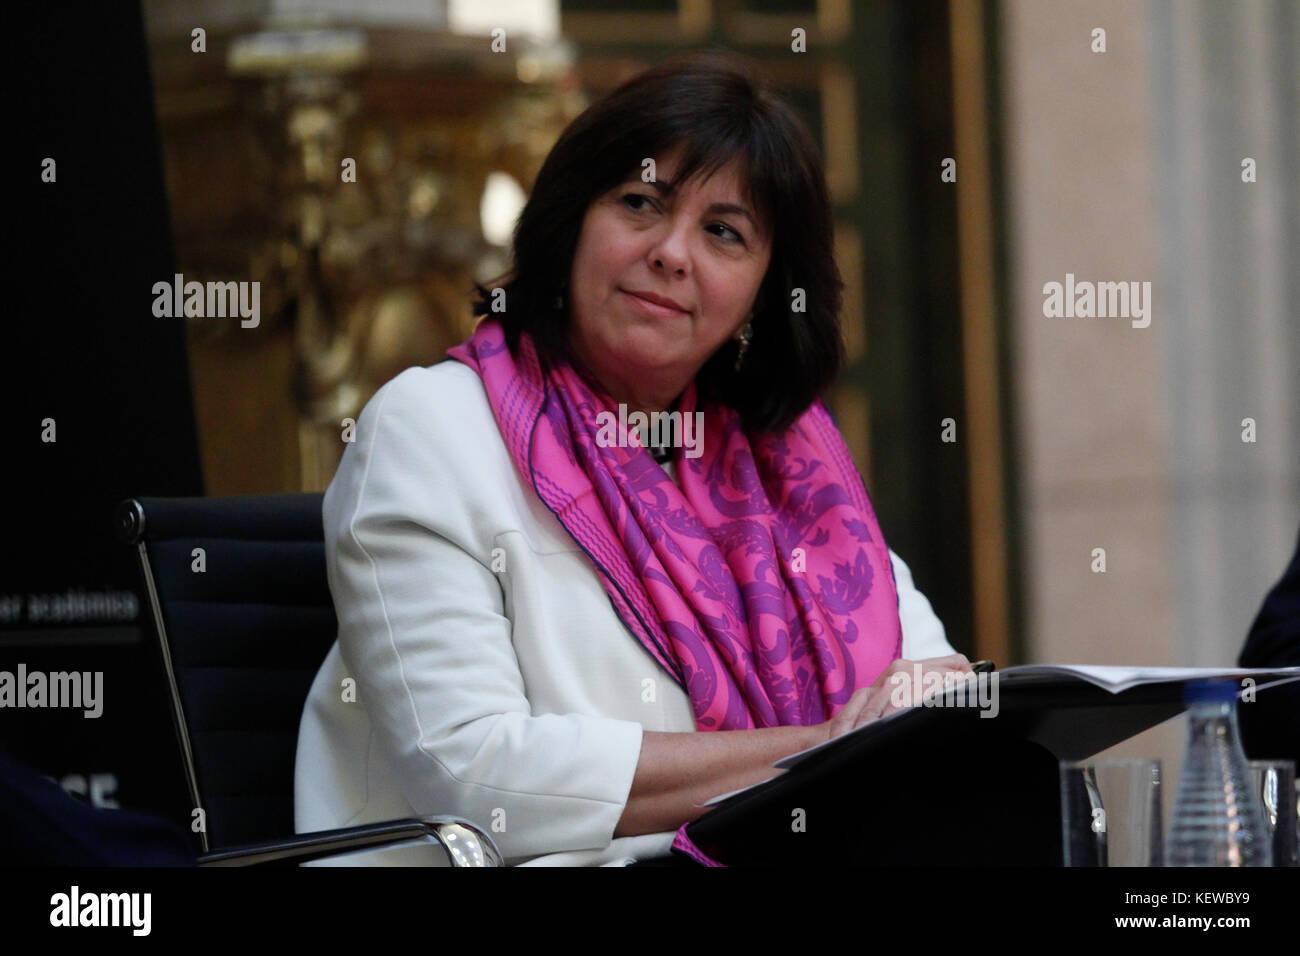 Maricris Garcia (b. 1987) Maricris Garcia (b. 1987) new images